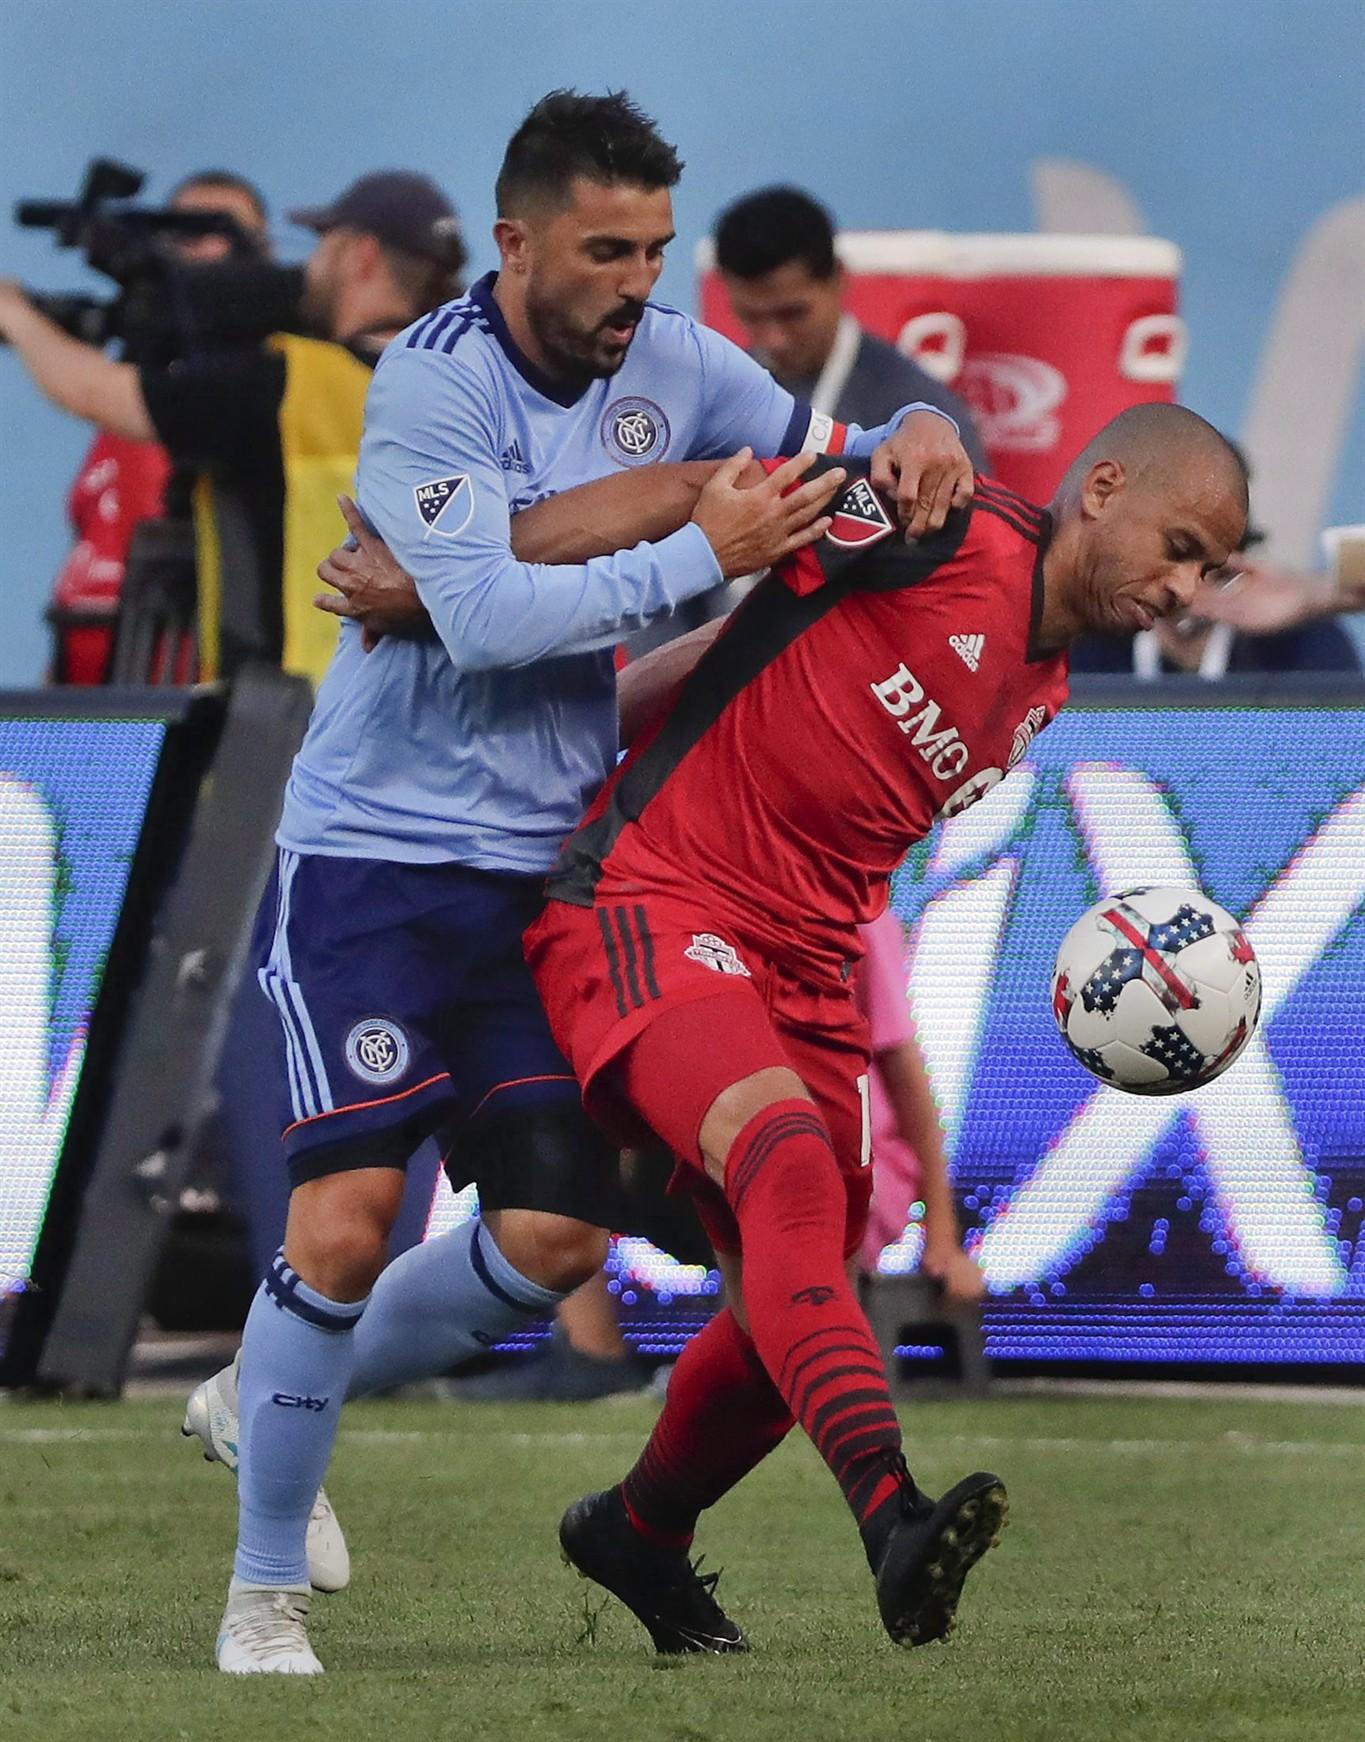 Toronto FC defender Jason Hernandez ponders his future after 14 MLS